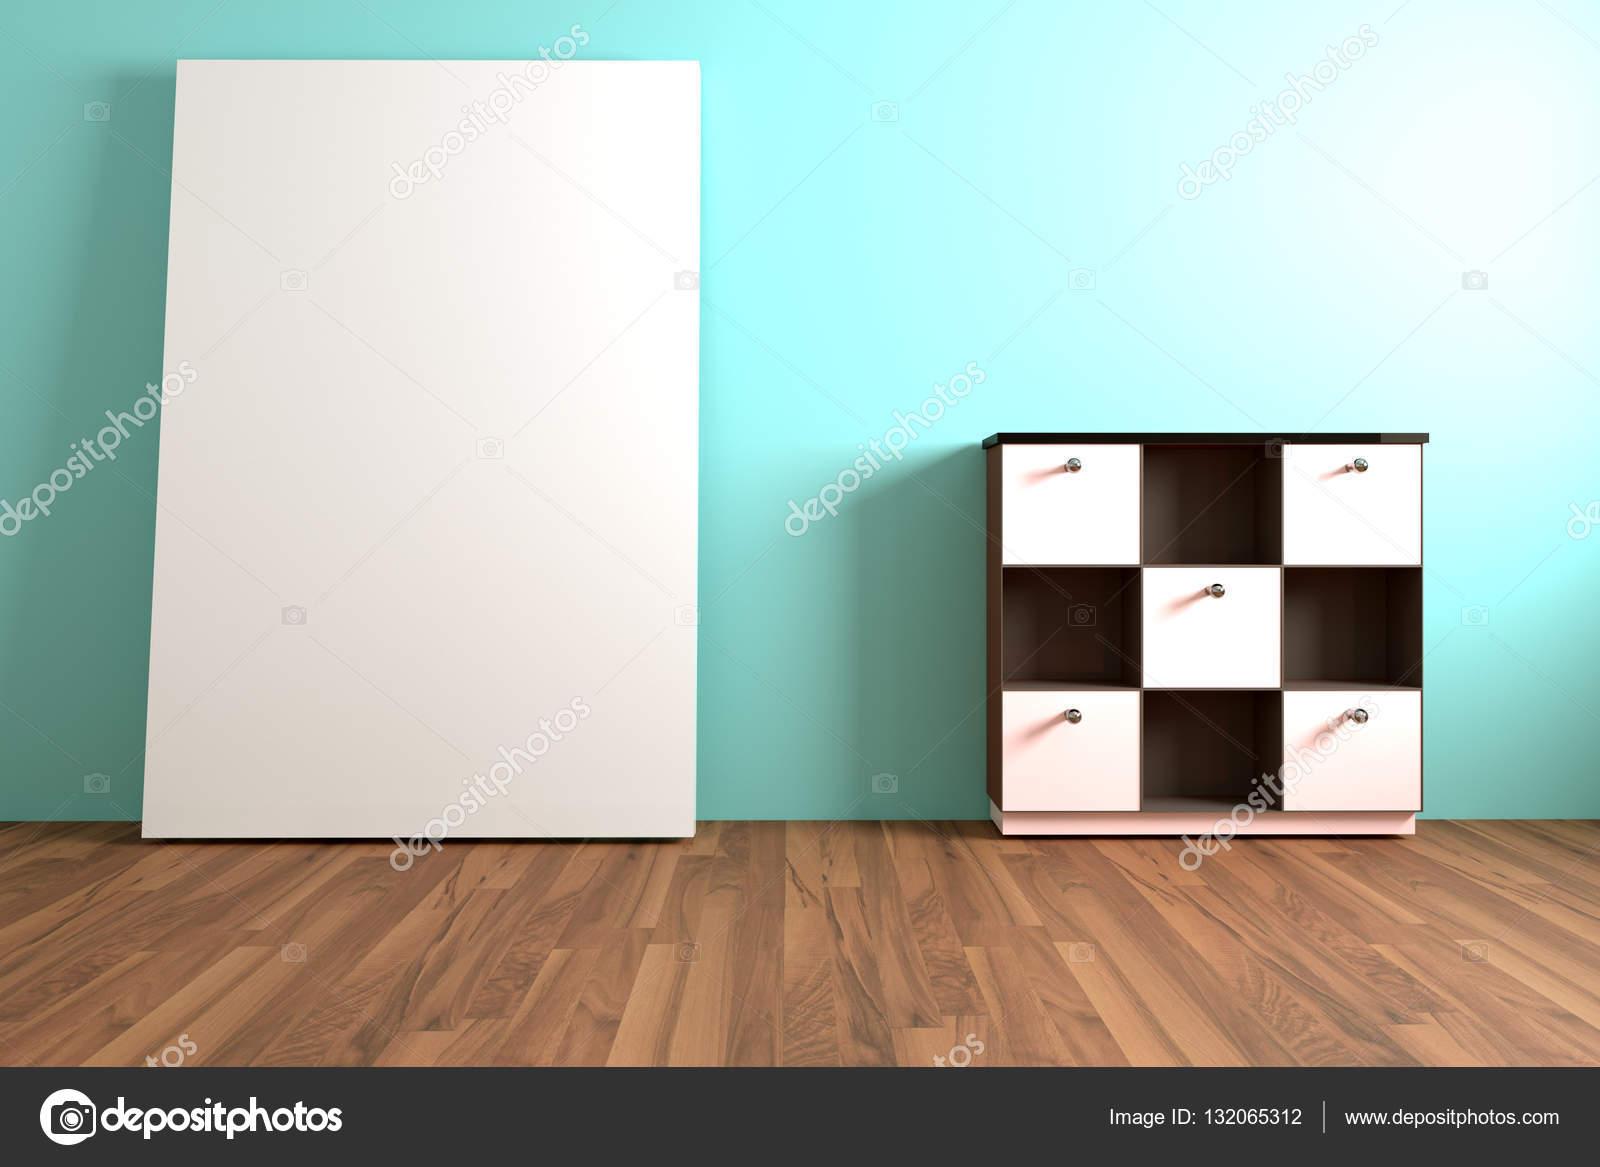 Möbel Leer holz regal und weiße möbel mit weißen leer in leer stockfoto